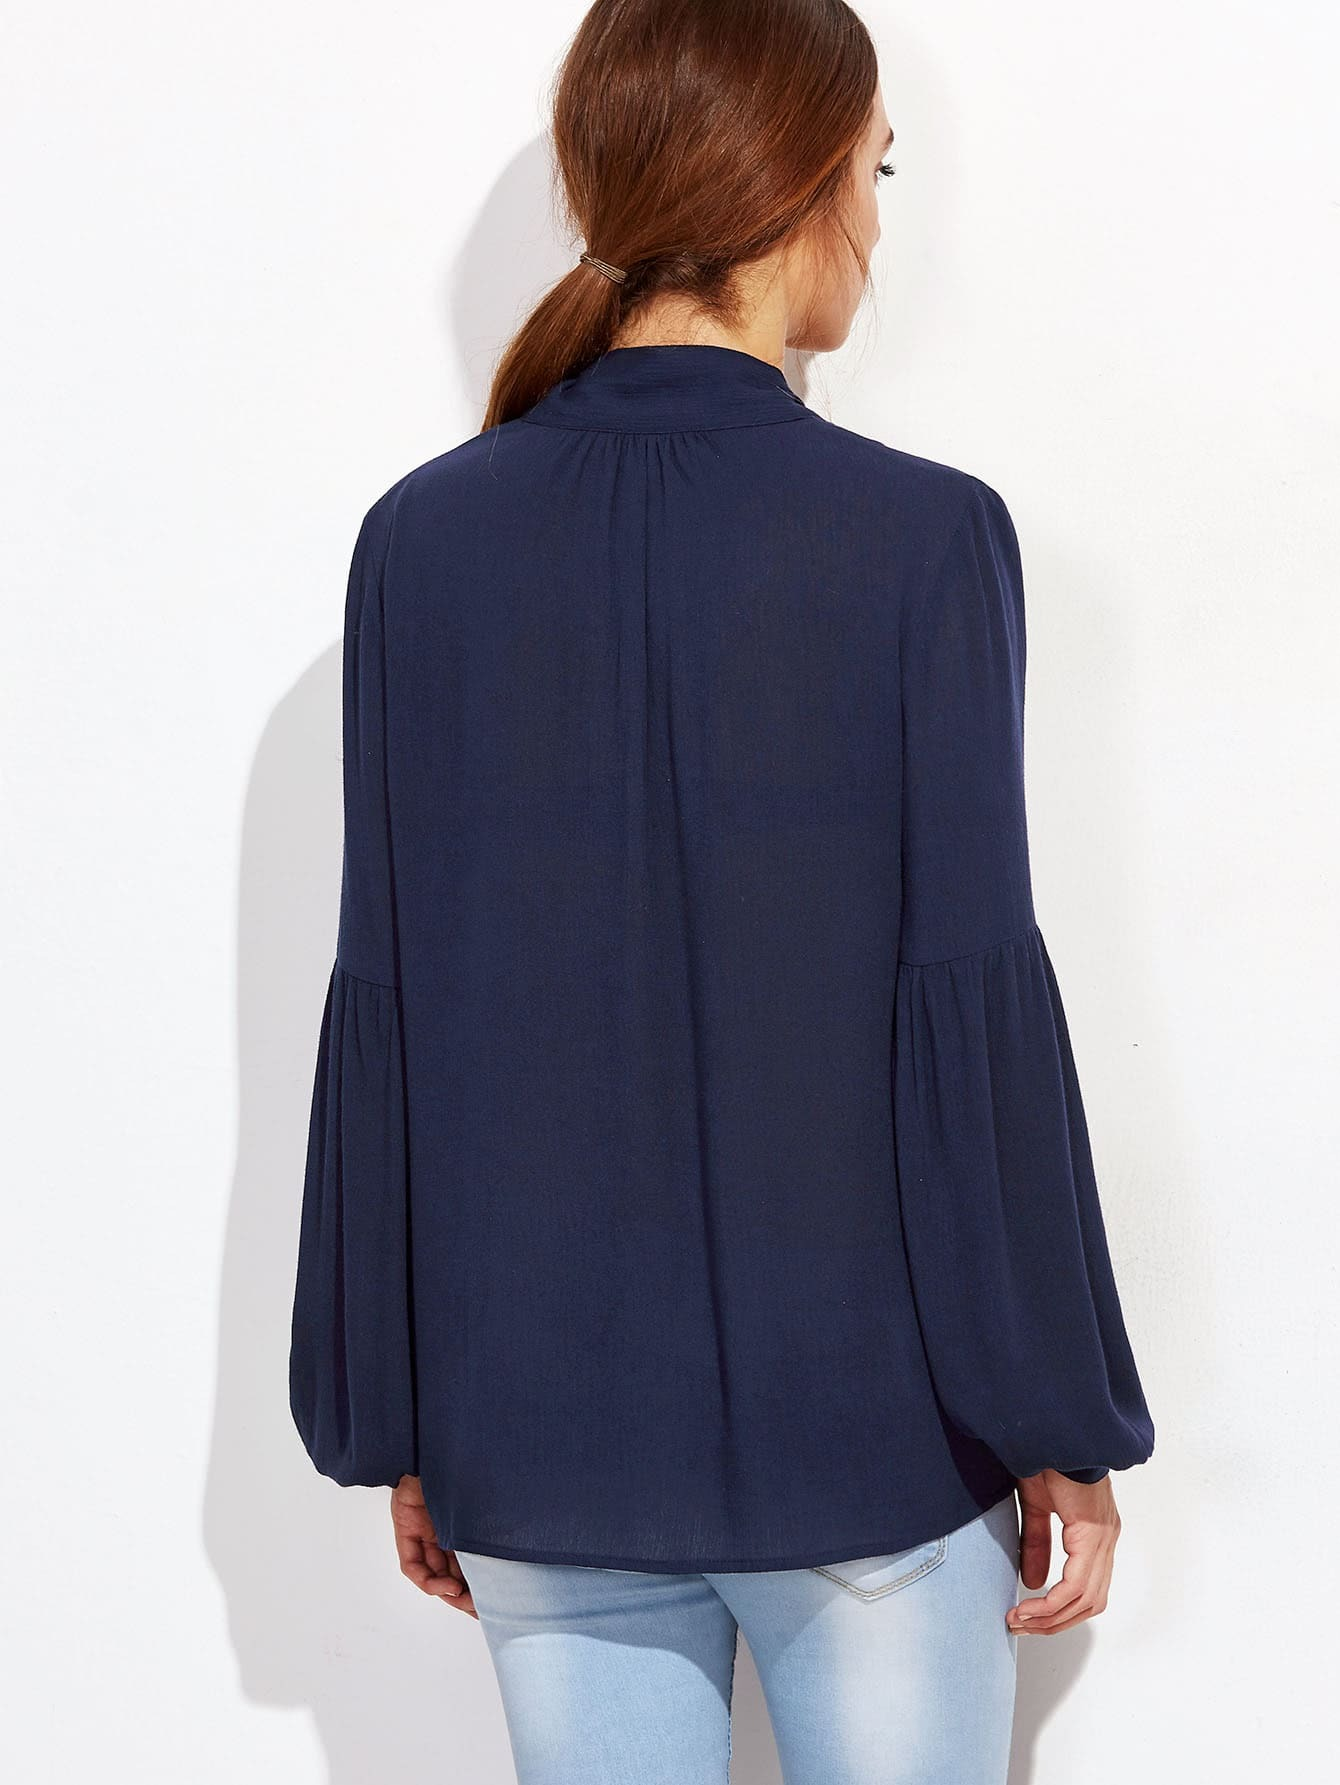 blouse161011705_2